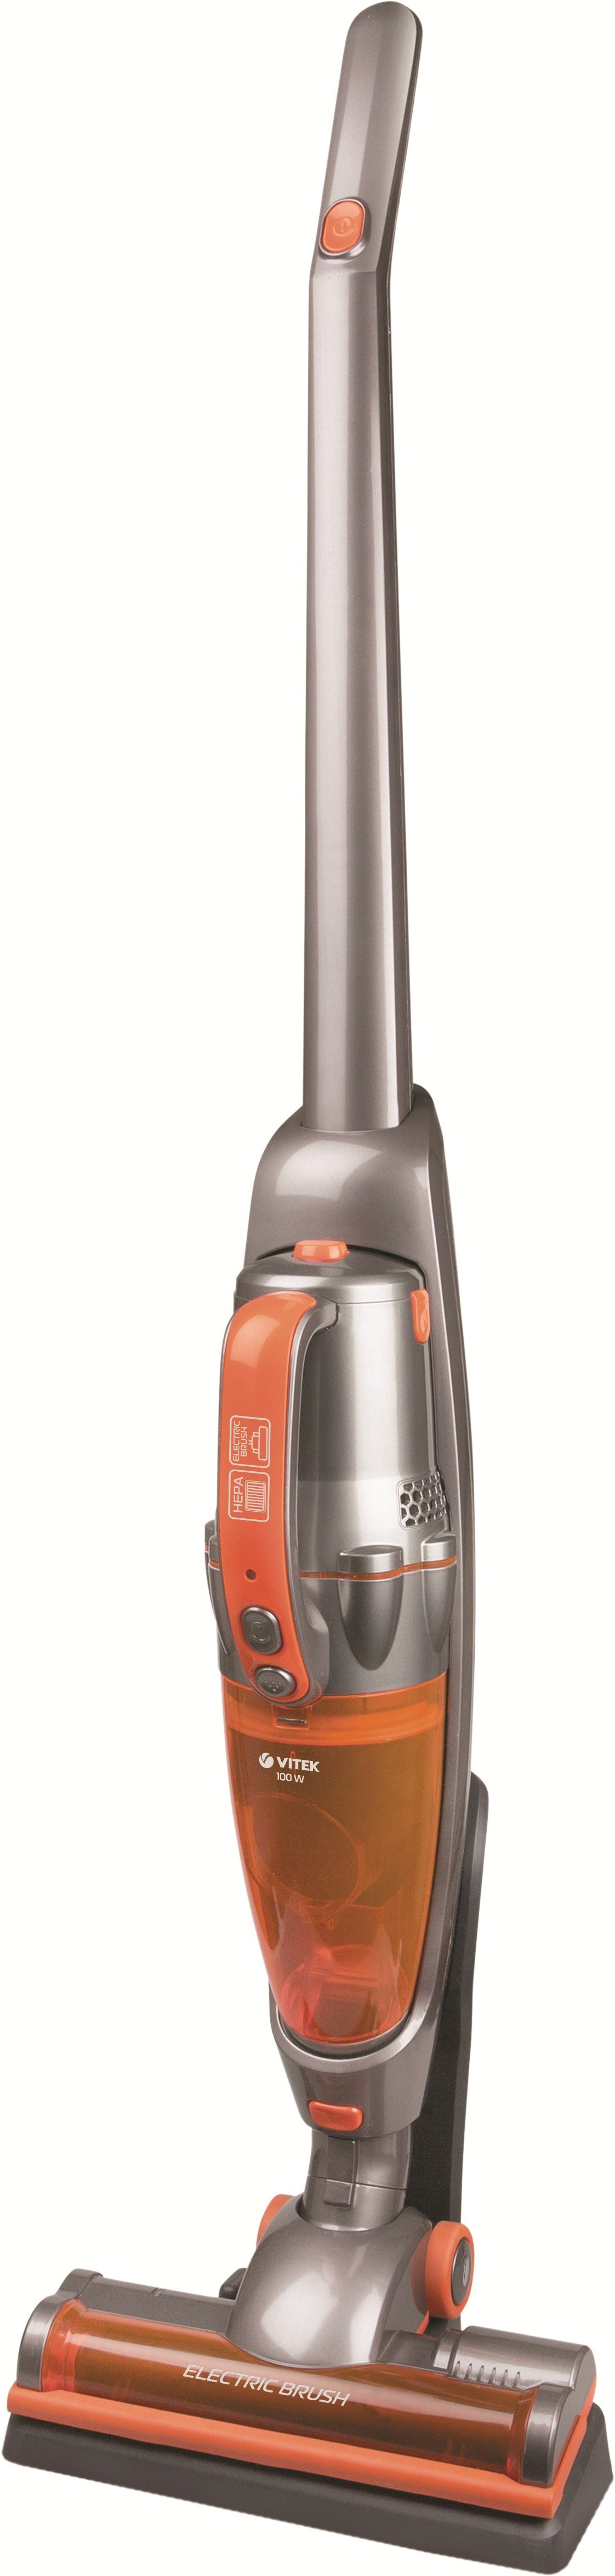 View VITEK VT-1819-I Dry Vacuum Cleaner(Orange, Brown, Black) Home Appliances Price Online(VITEK)